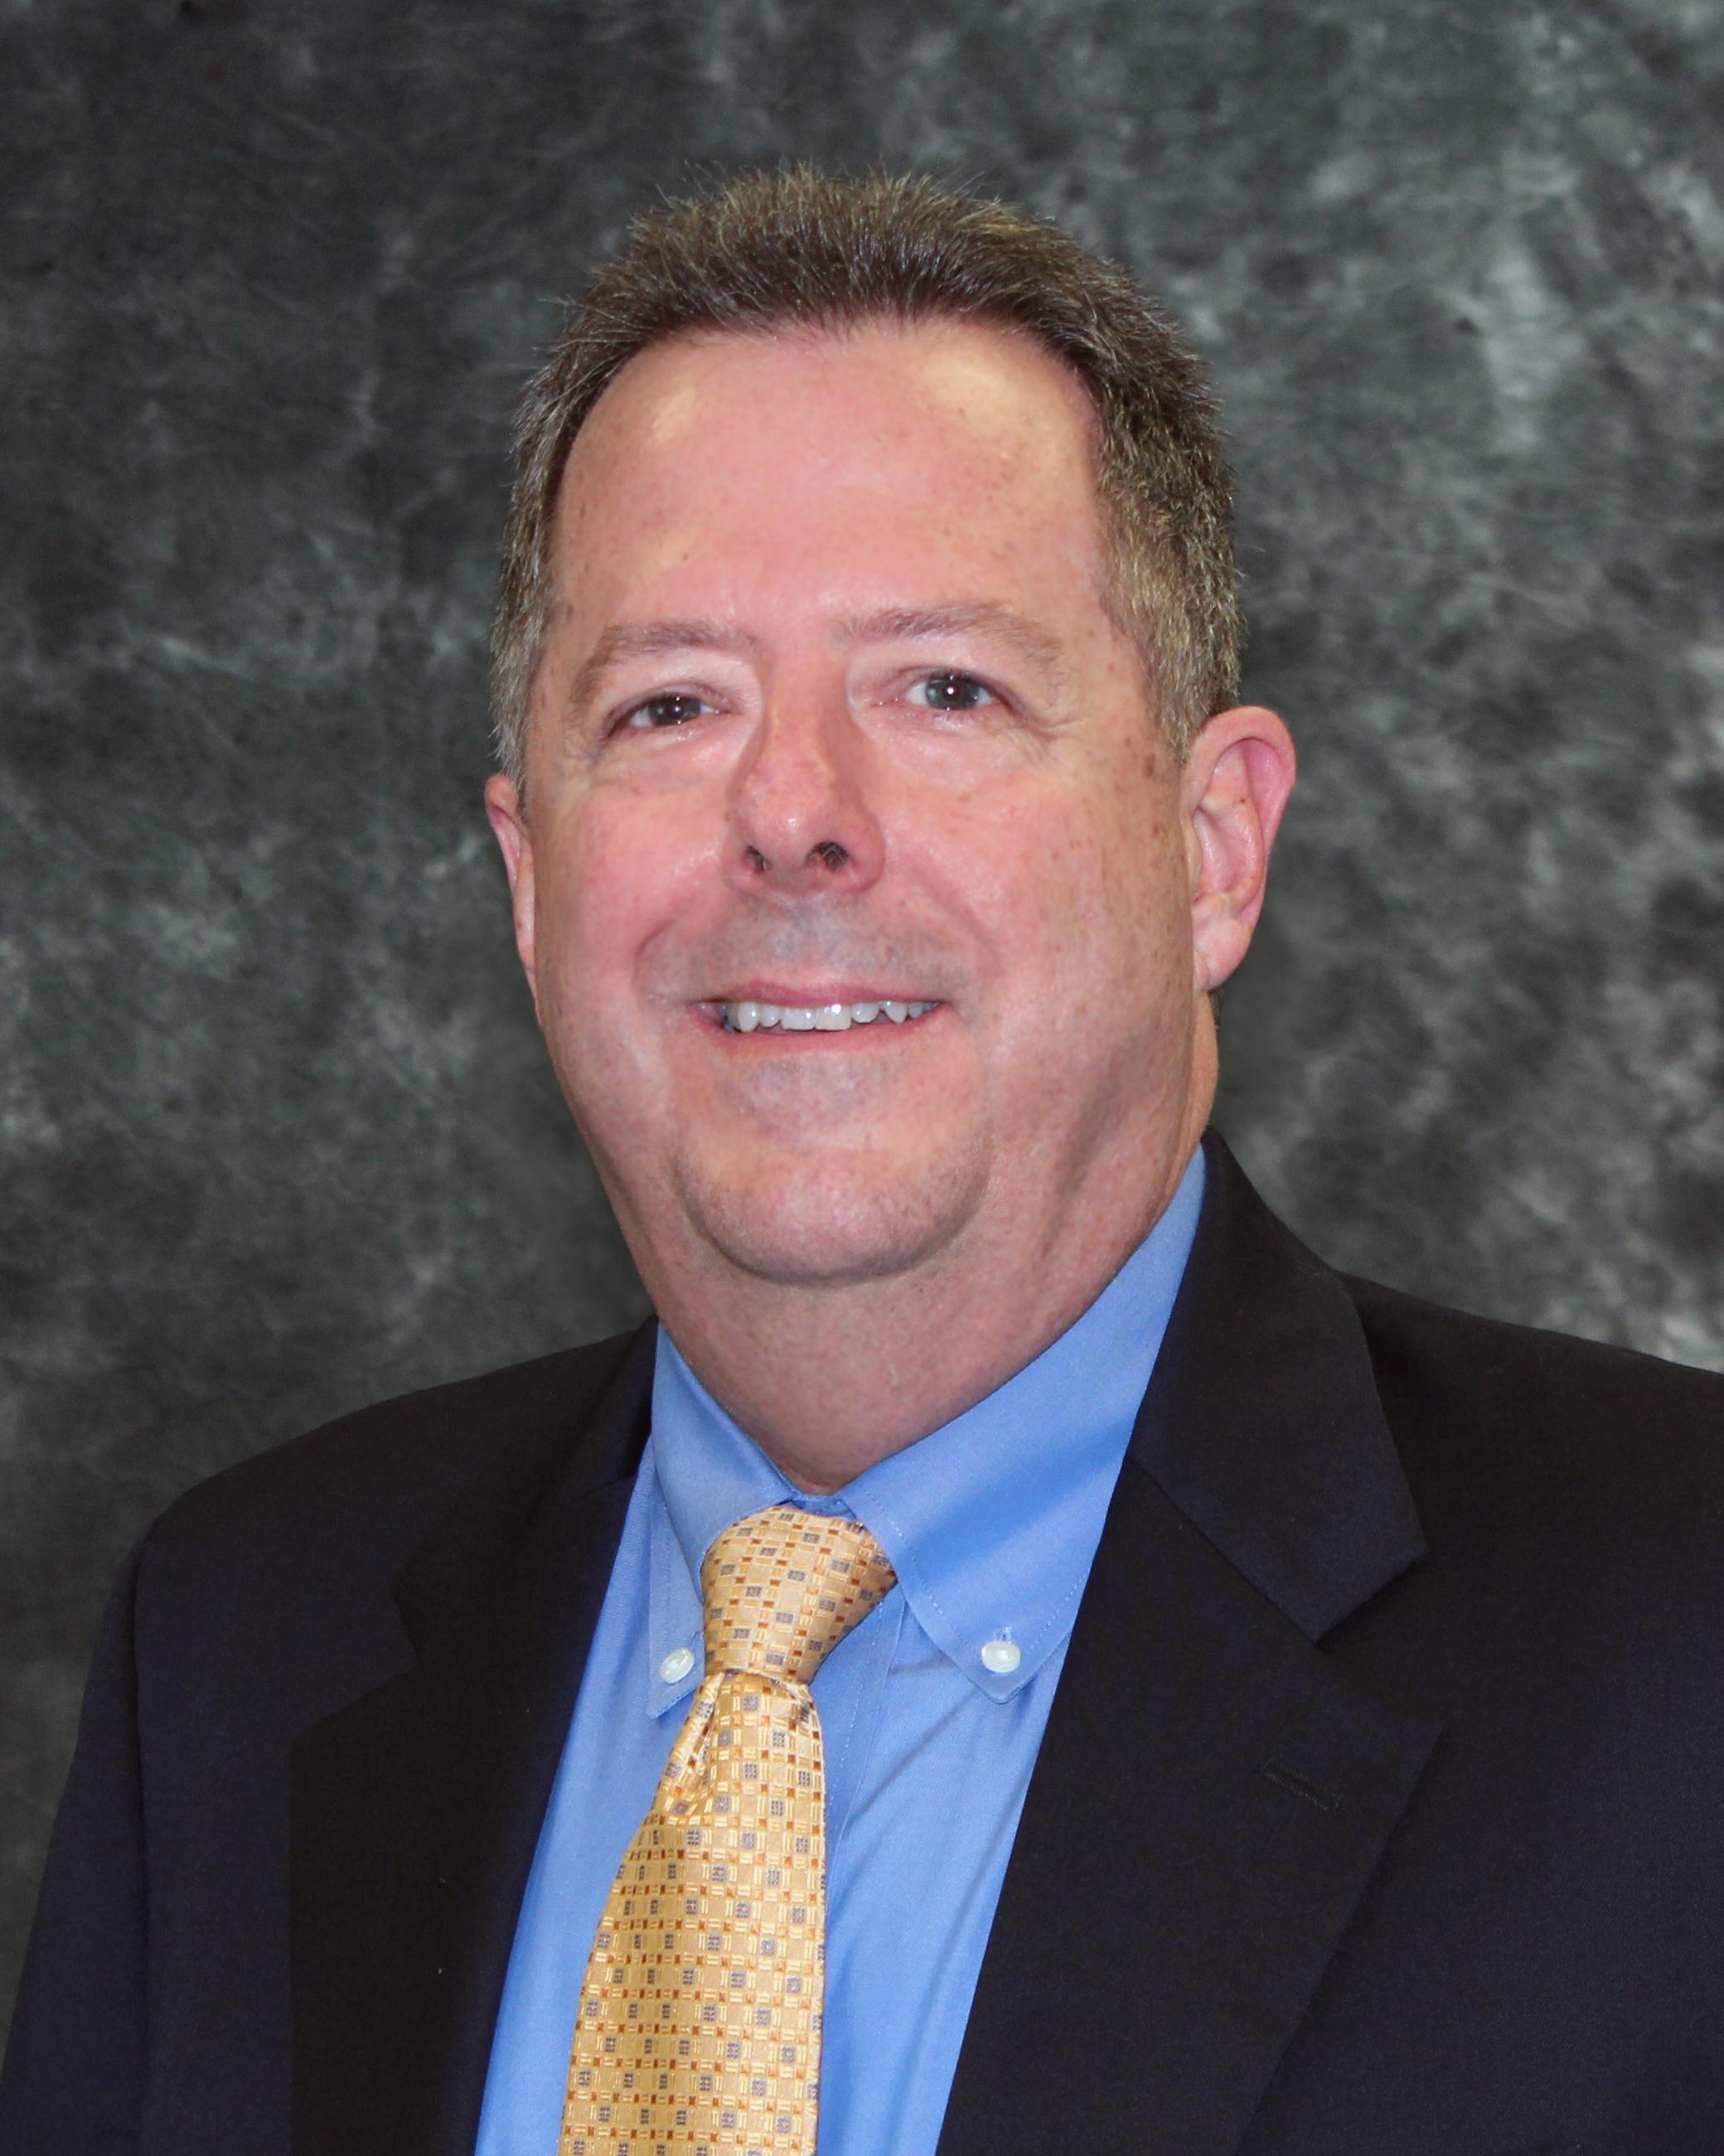 Patrick J. Ahern, JD, LCSW